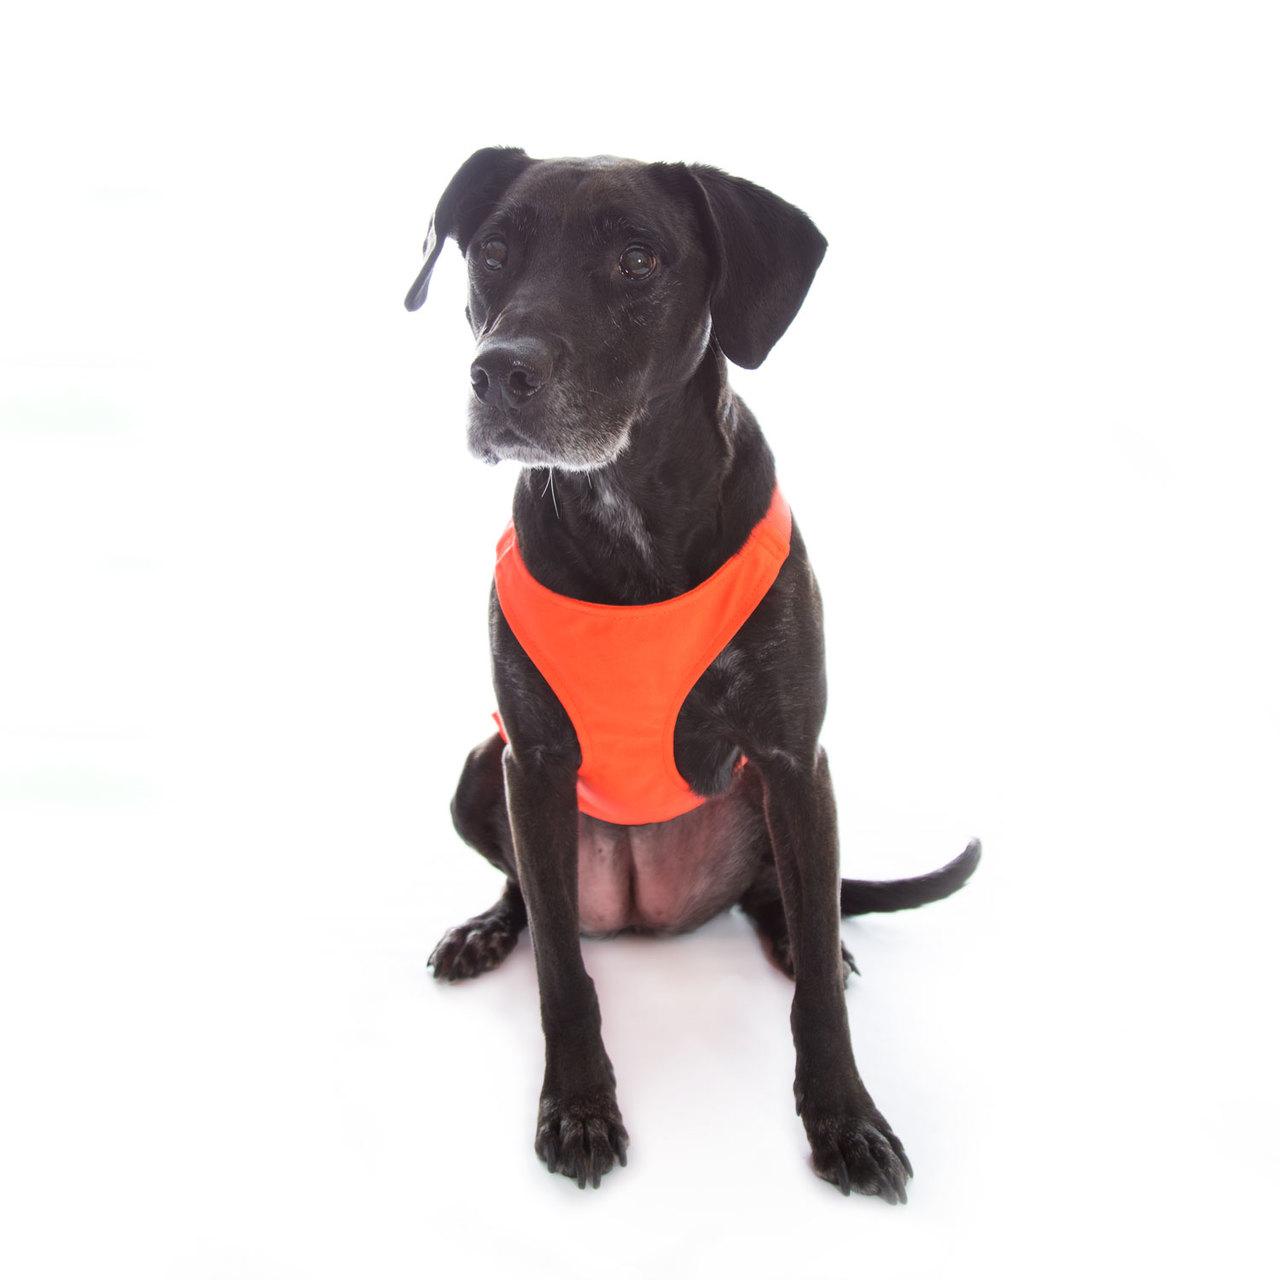 Mendota Skid Plate for Dogs